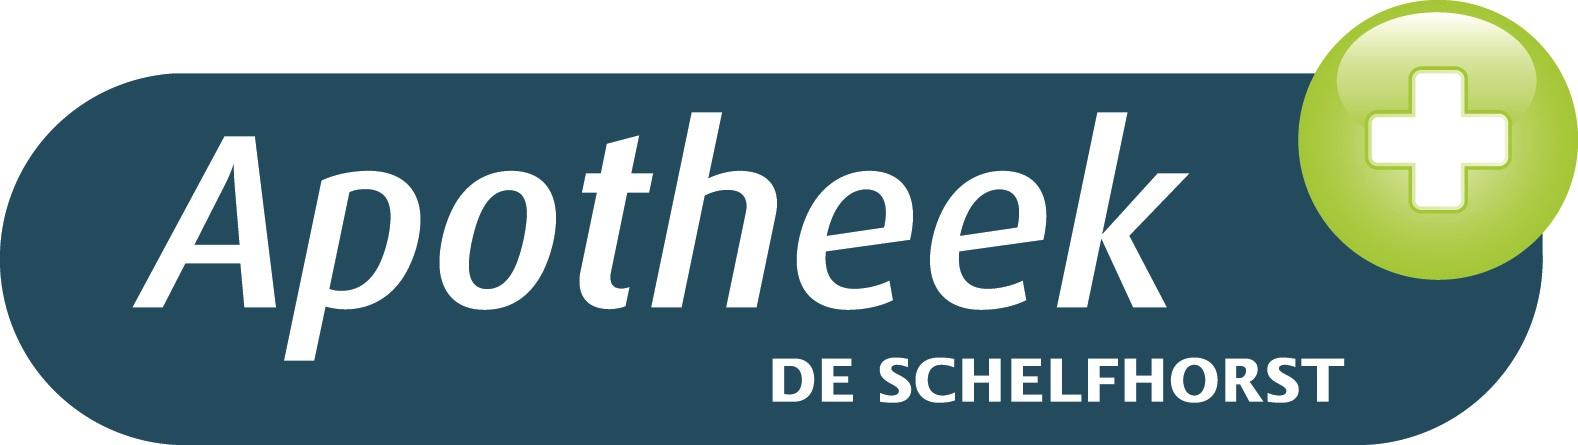 Startpagina Apotheek de Schelfhorst